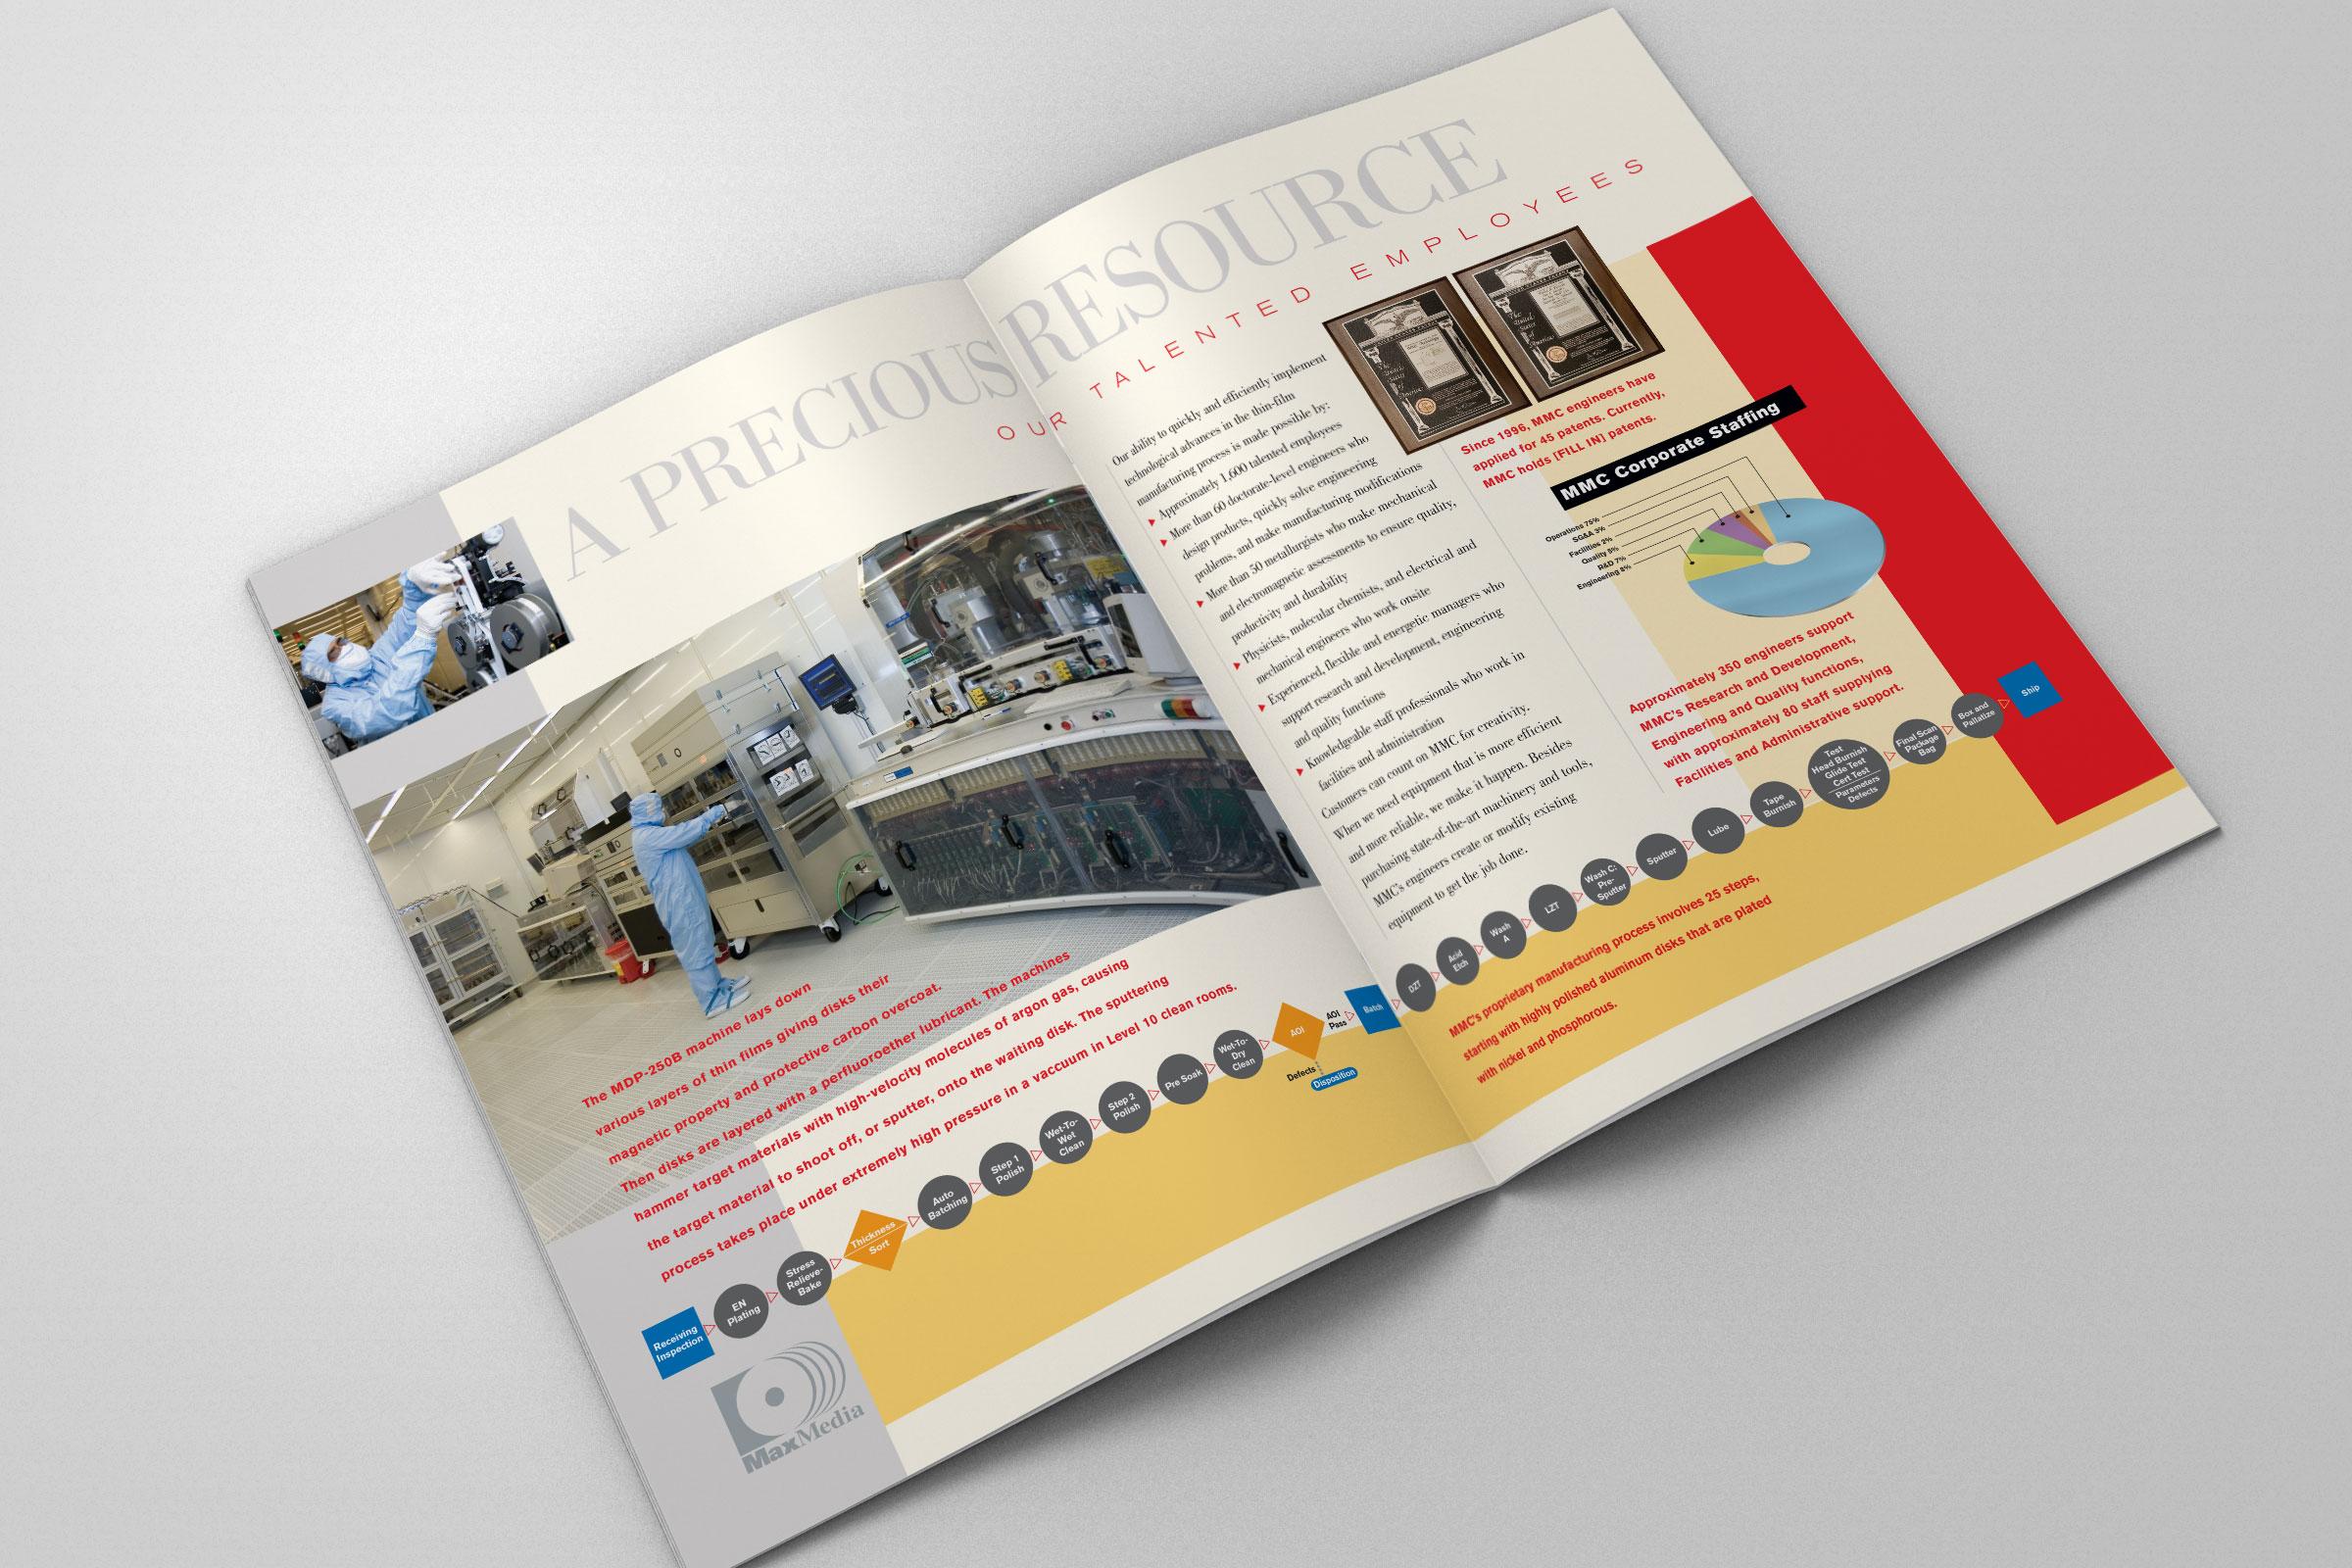 MaxMedia Corporate Capabilities Brochure (Copyright SHM Publishing, Inc.)